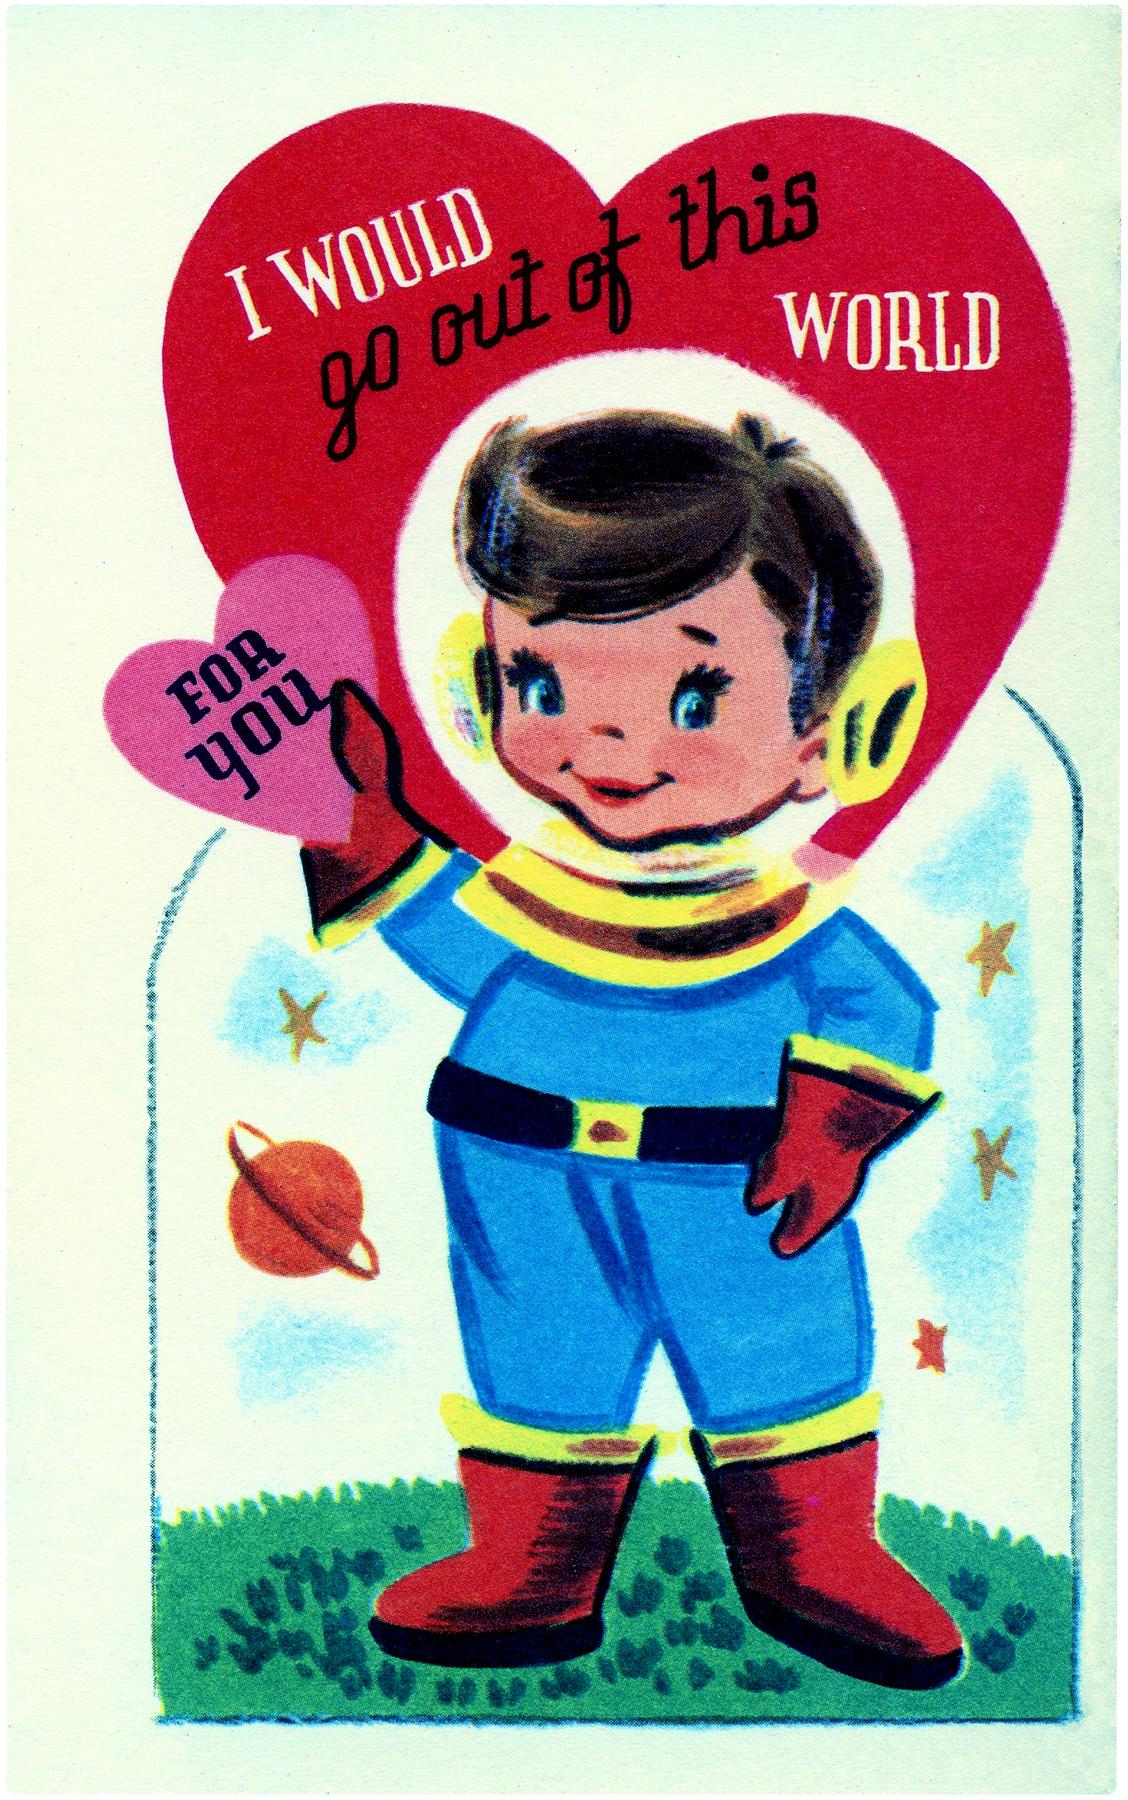 Retro Astronaut Image